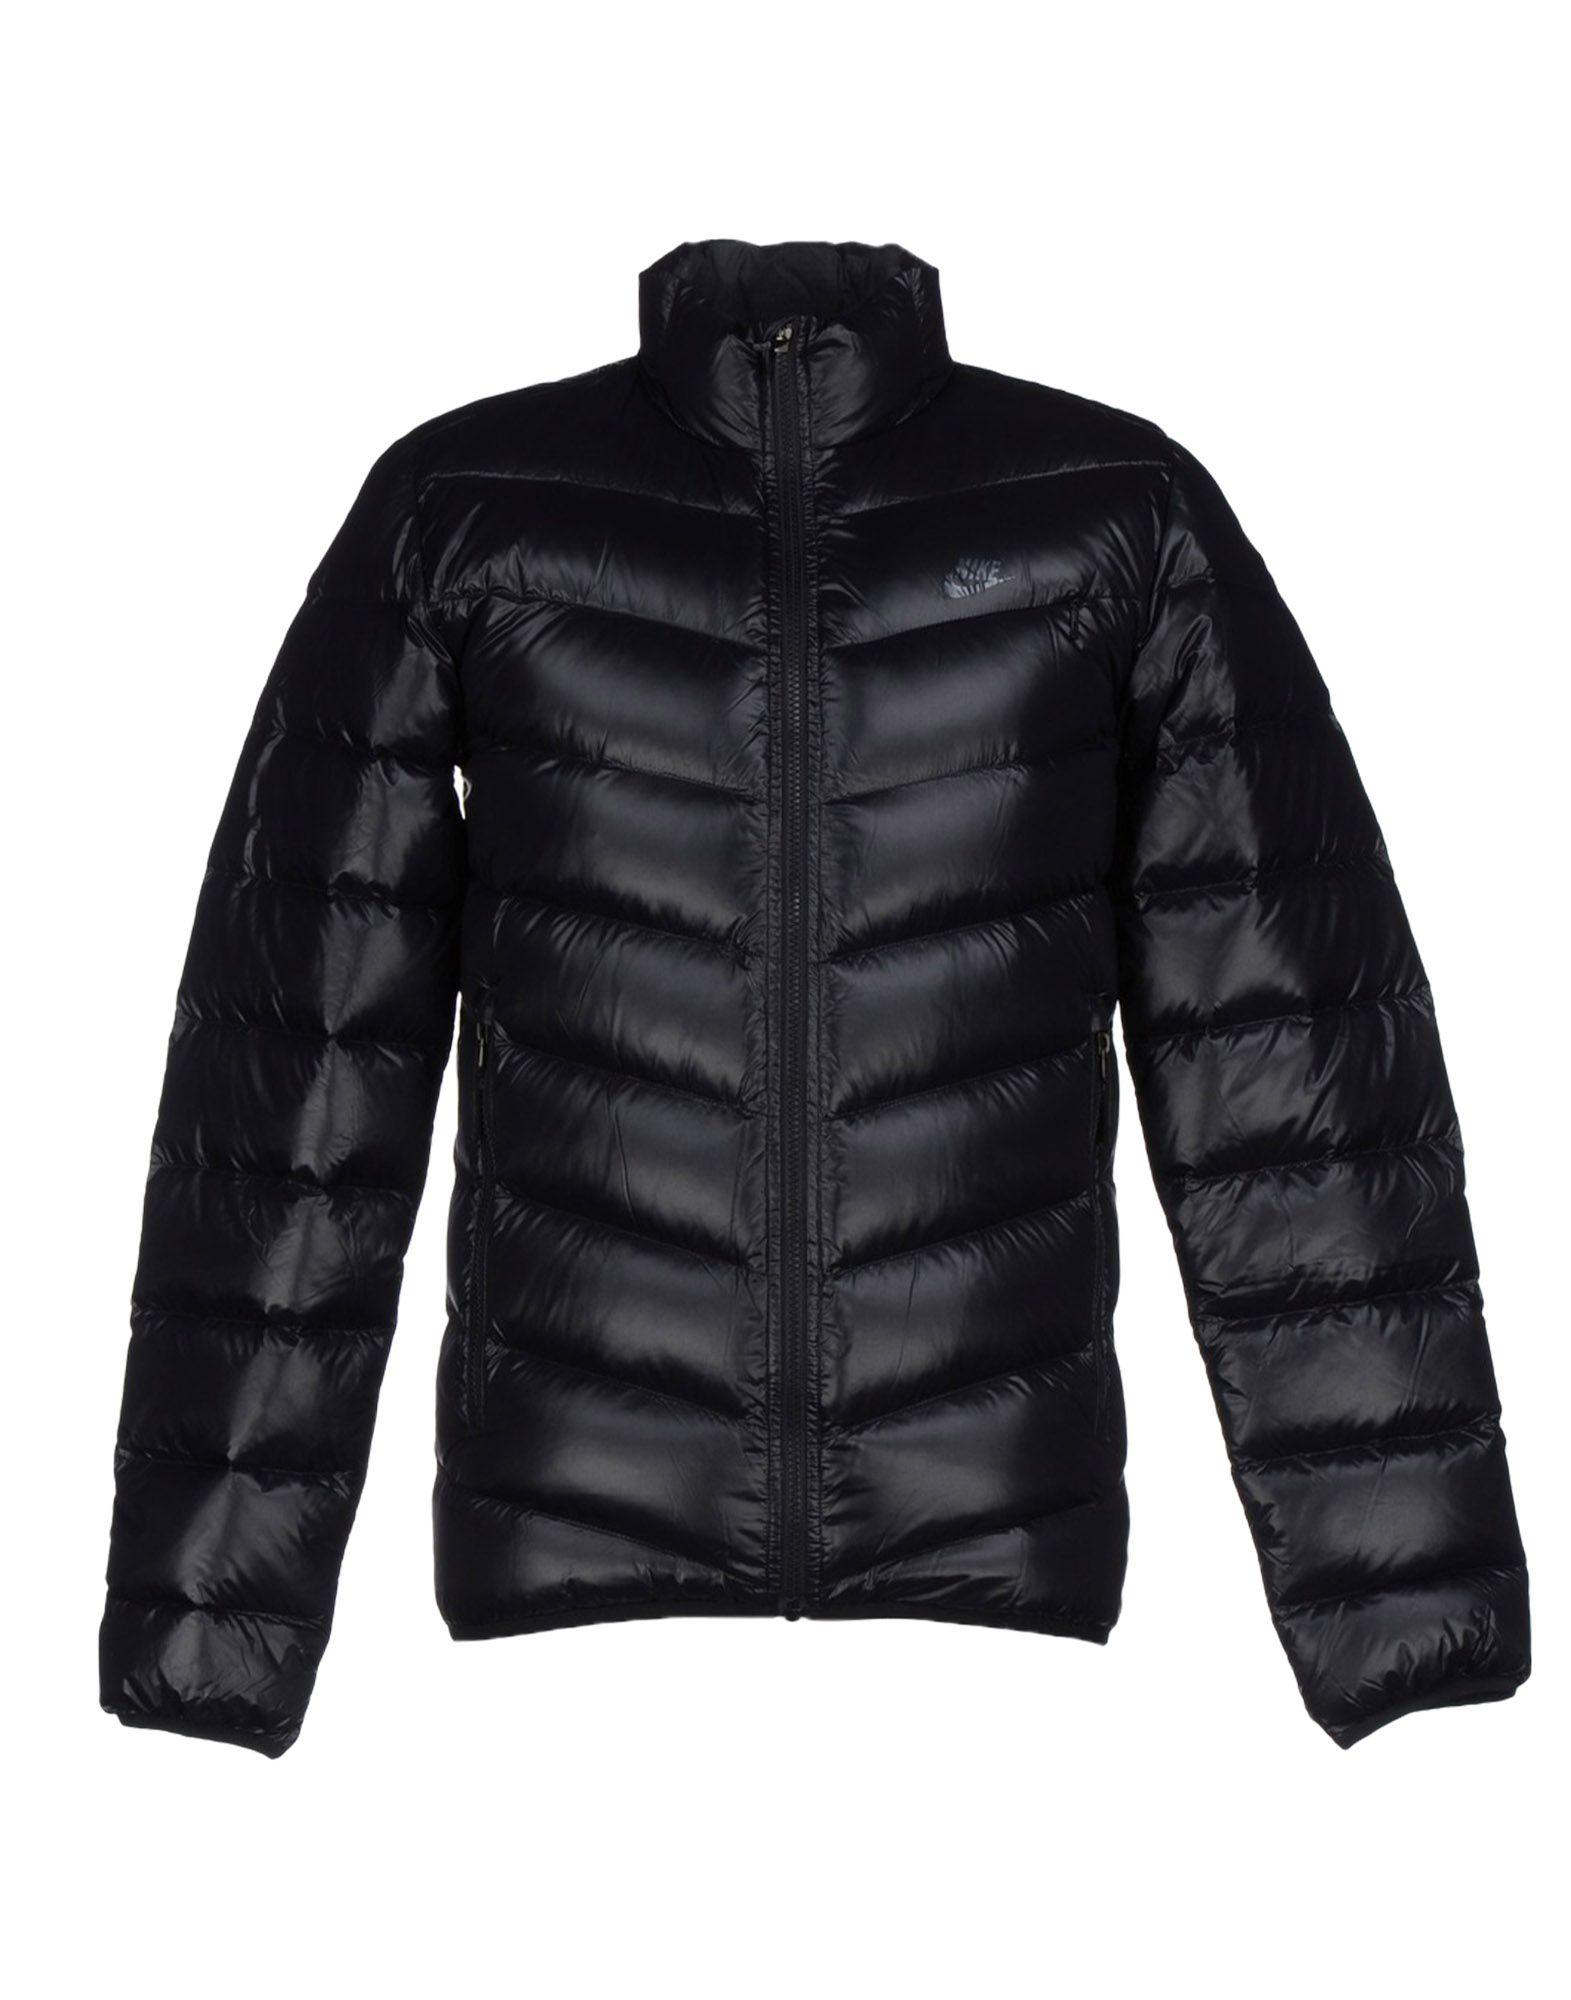 Nike Down Jacket in Black for Men